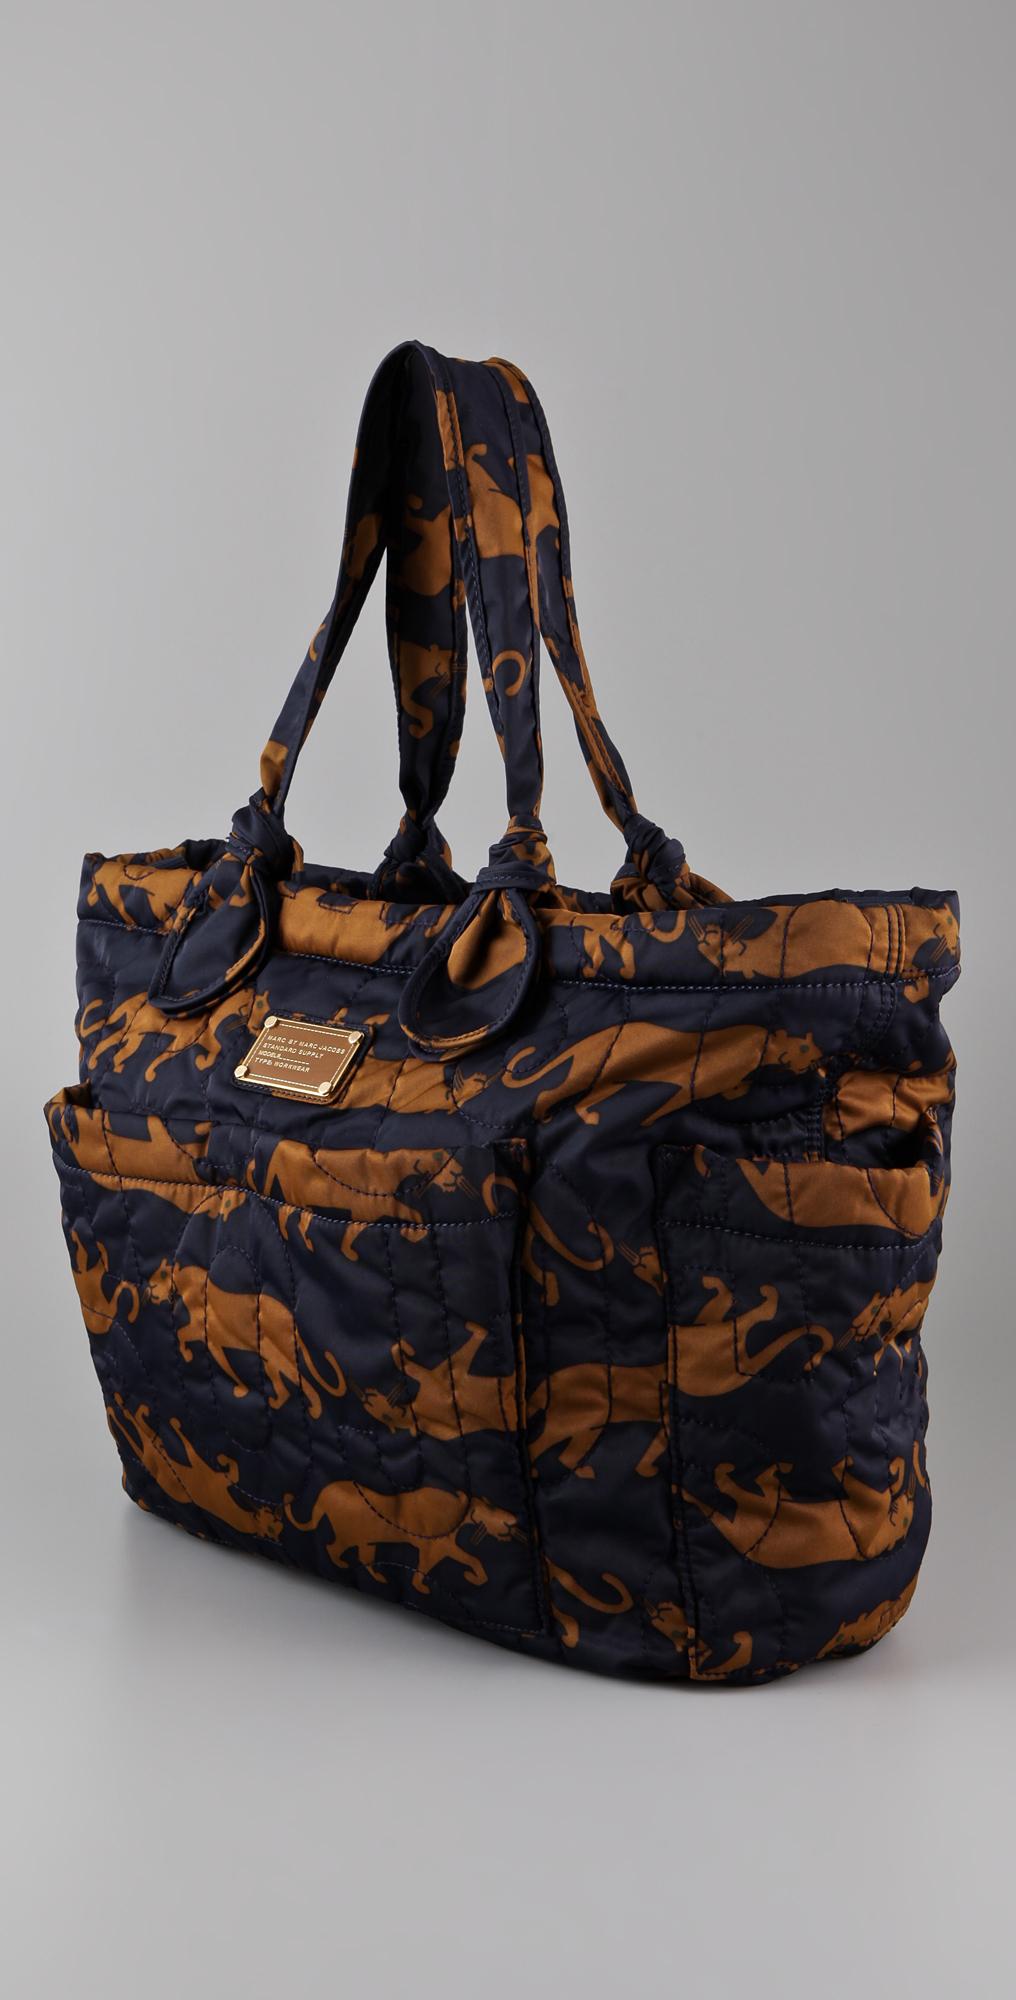 d8ce9befc818 Marc by Marc Jacobs Pretty Nylon Eliz-a-Baby Bag